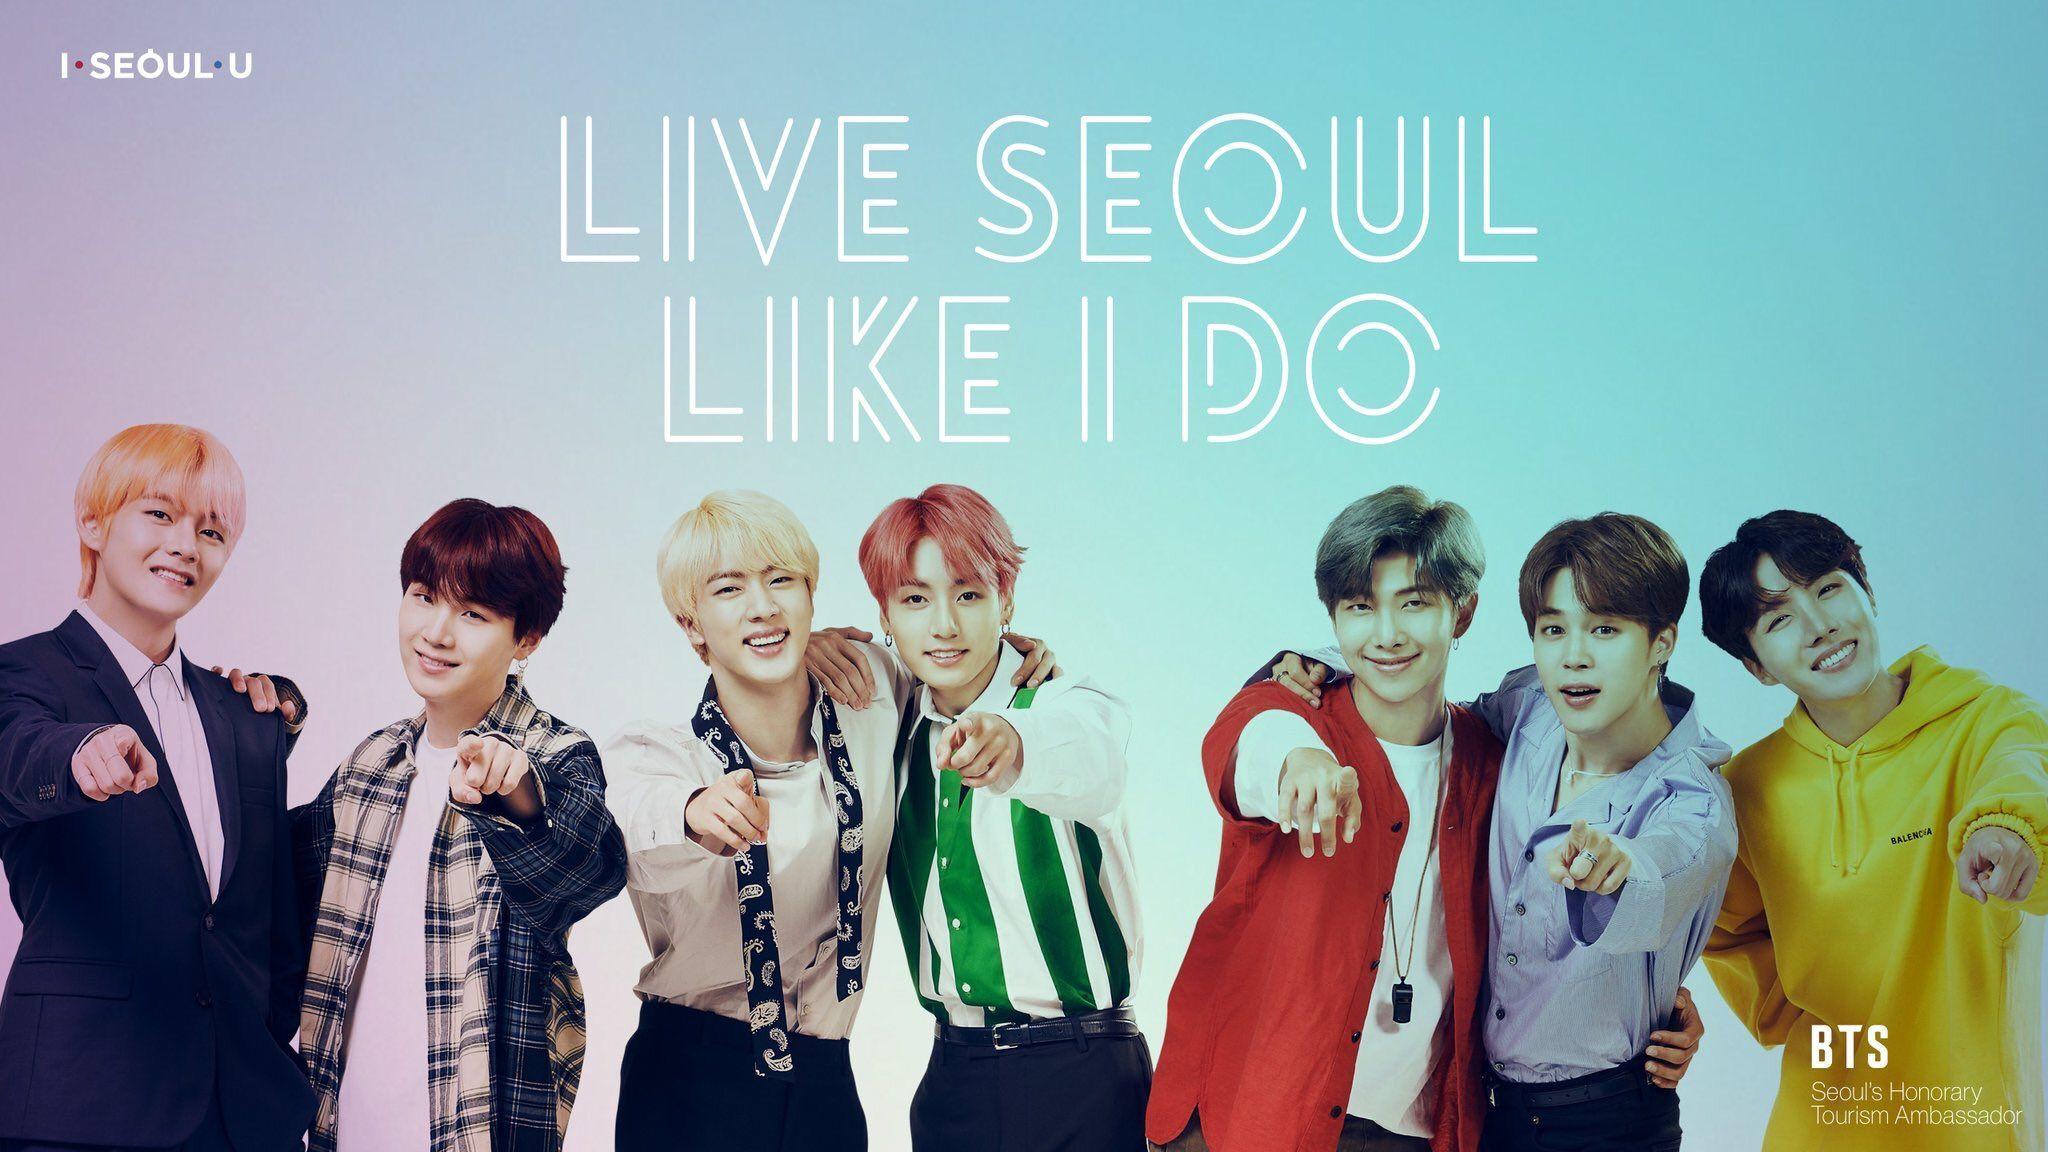 K Pop Global Seoul Bts Wallpaper Desktop Bts Bts wallpaper for windows 10